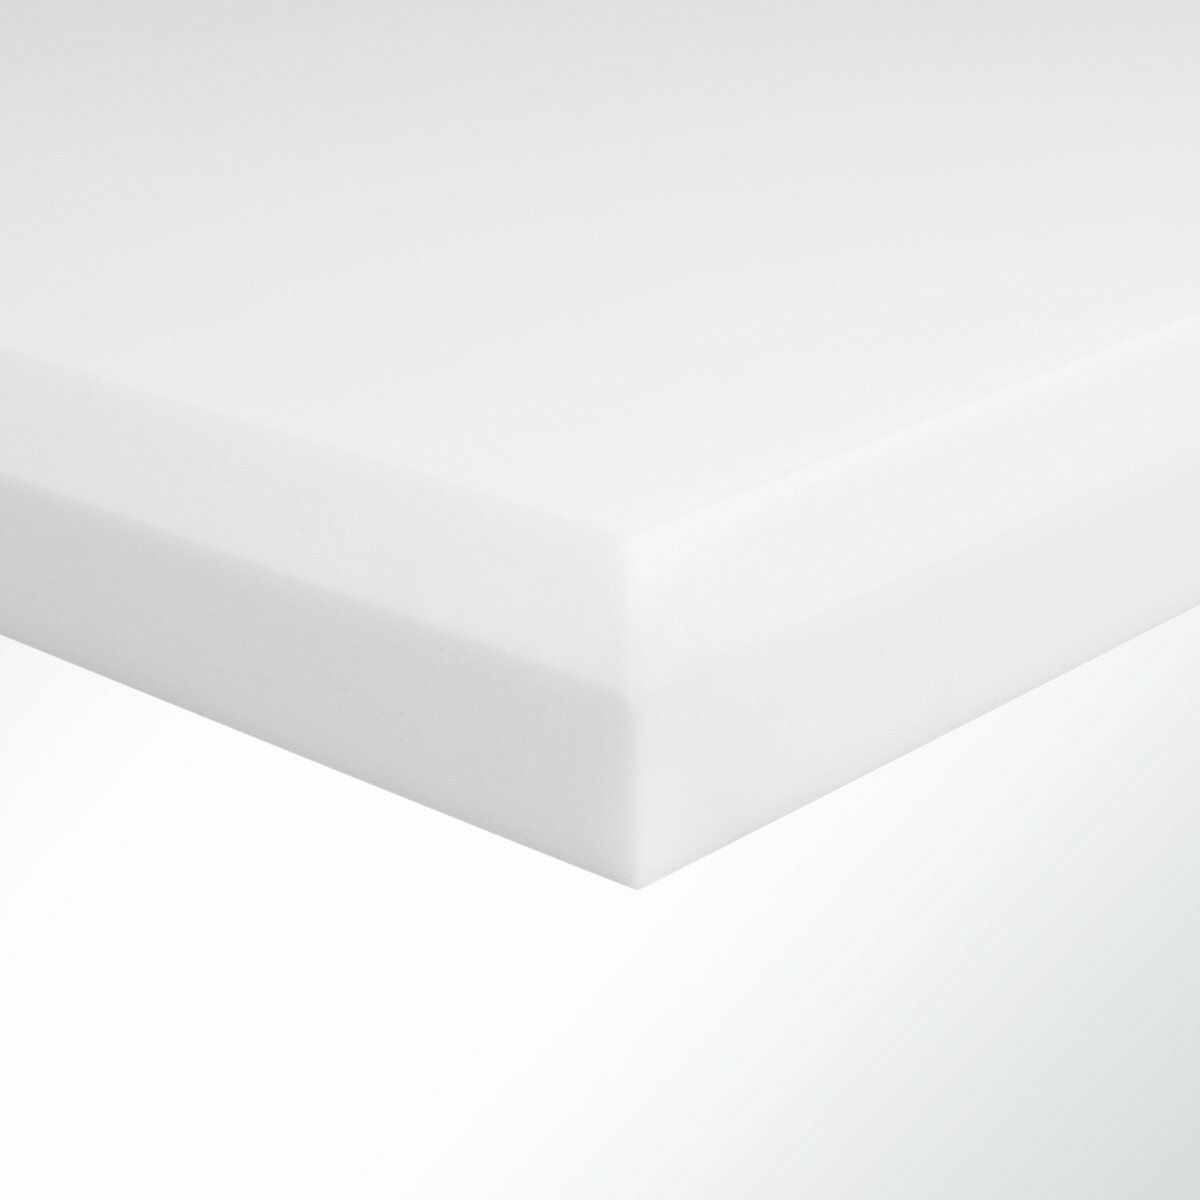 15x Akustik Schaumstoff Schall Dämmung 100x50x8cm aus Basotect® weiß mit Decor